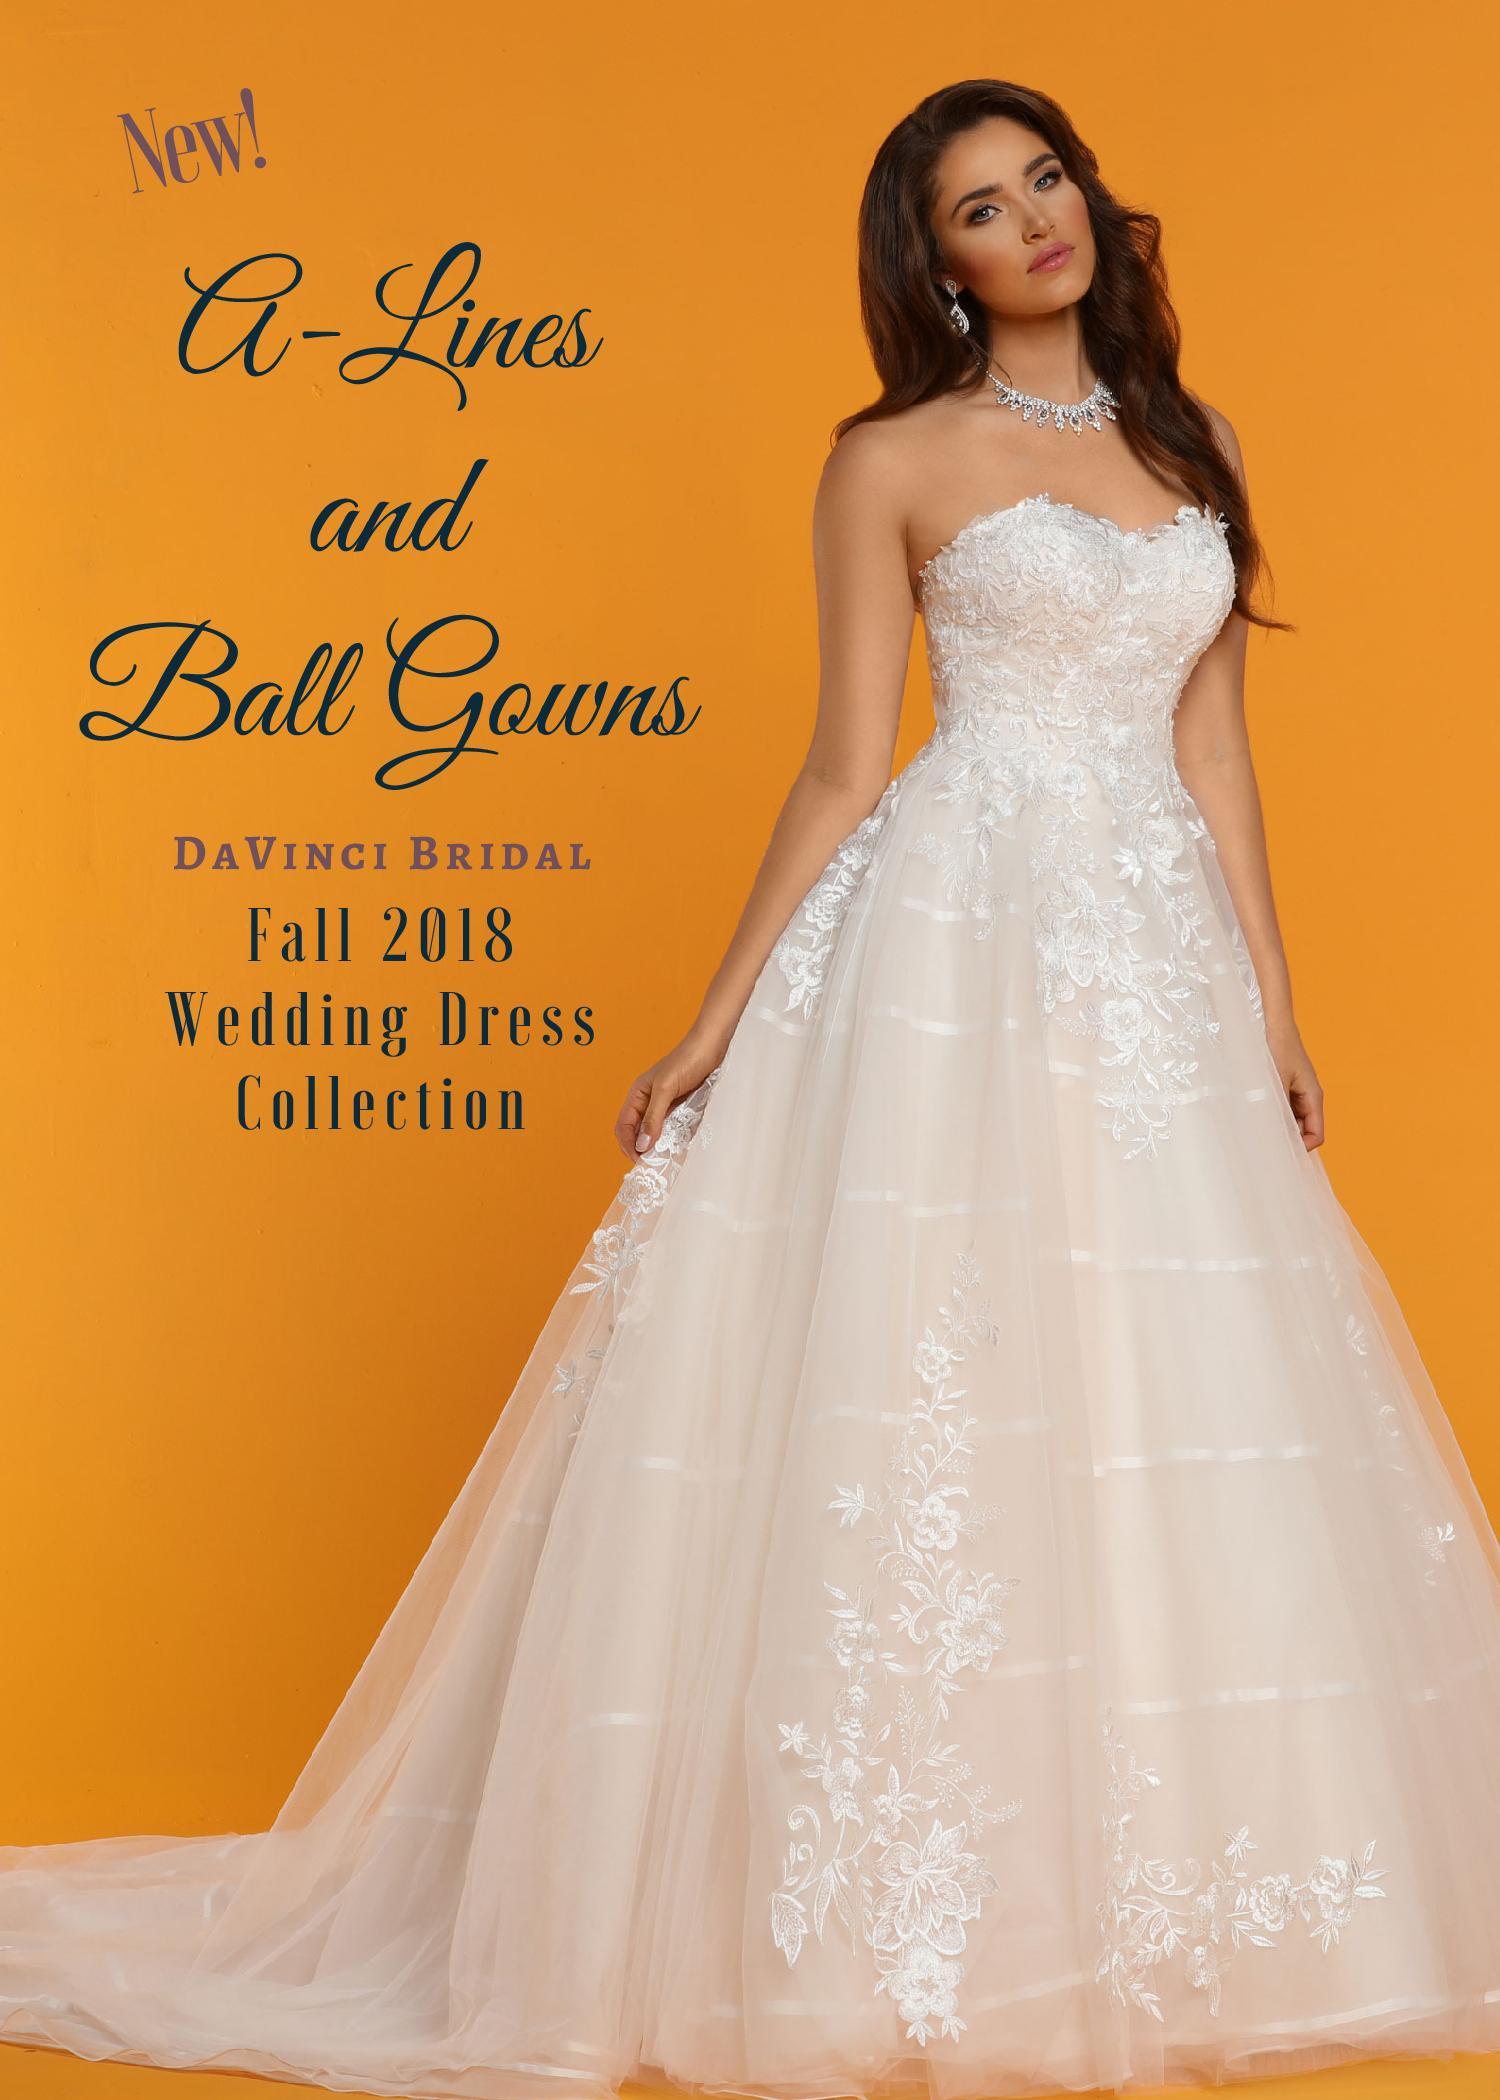 A-Line & Ball Gowns Fall 2018   DaVinci Bridal Blog